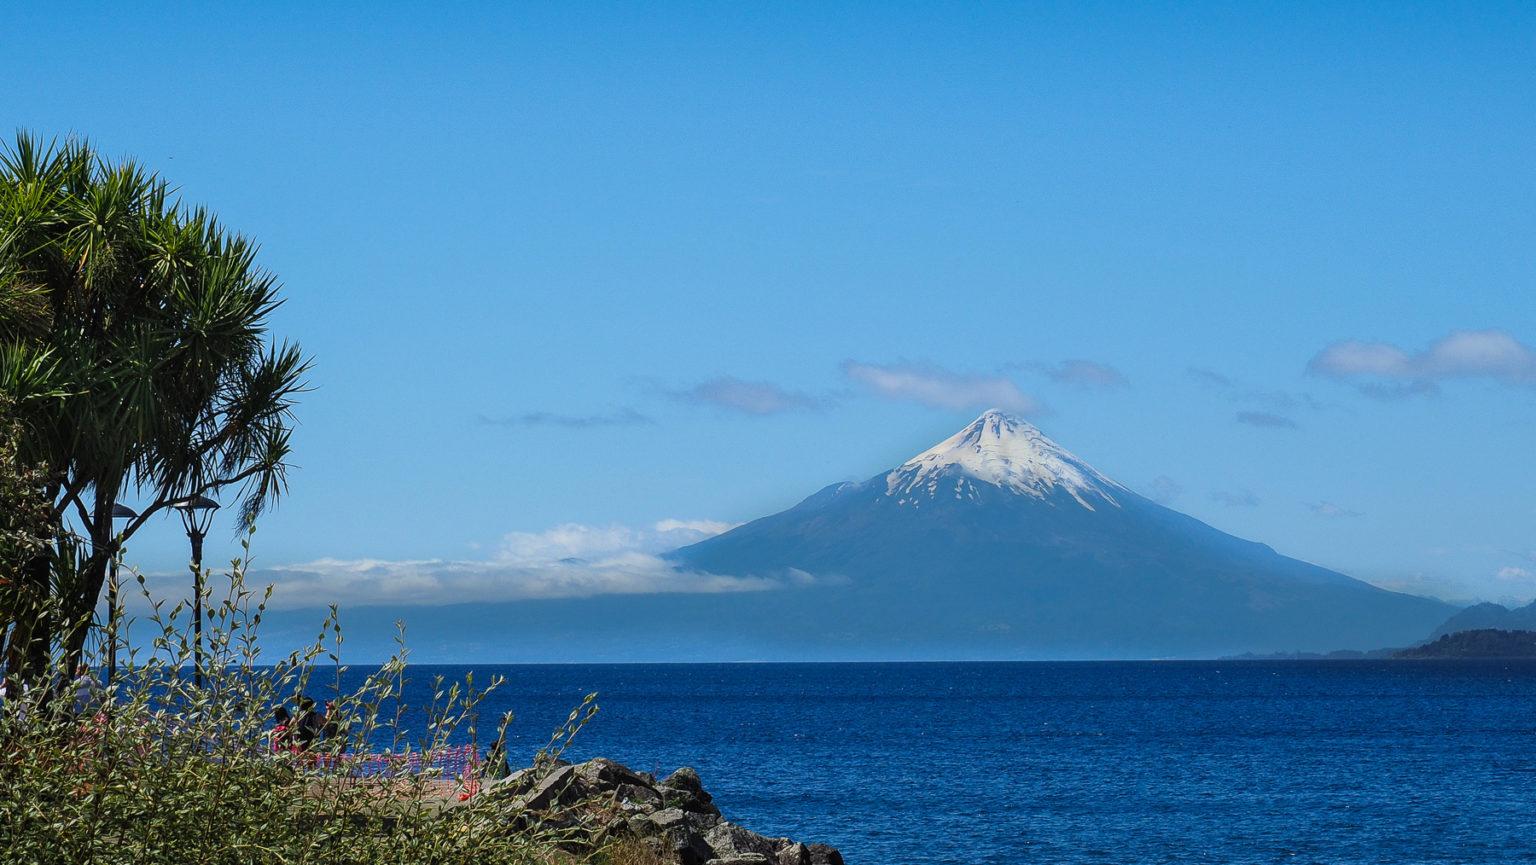 Llanquihe See mit Blick auf den Vulkan Osorno